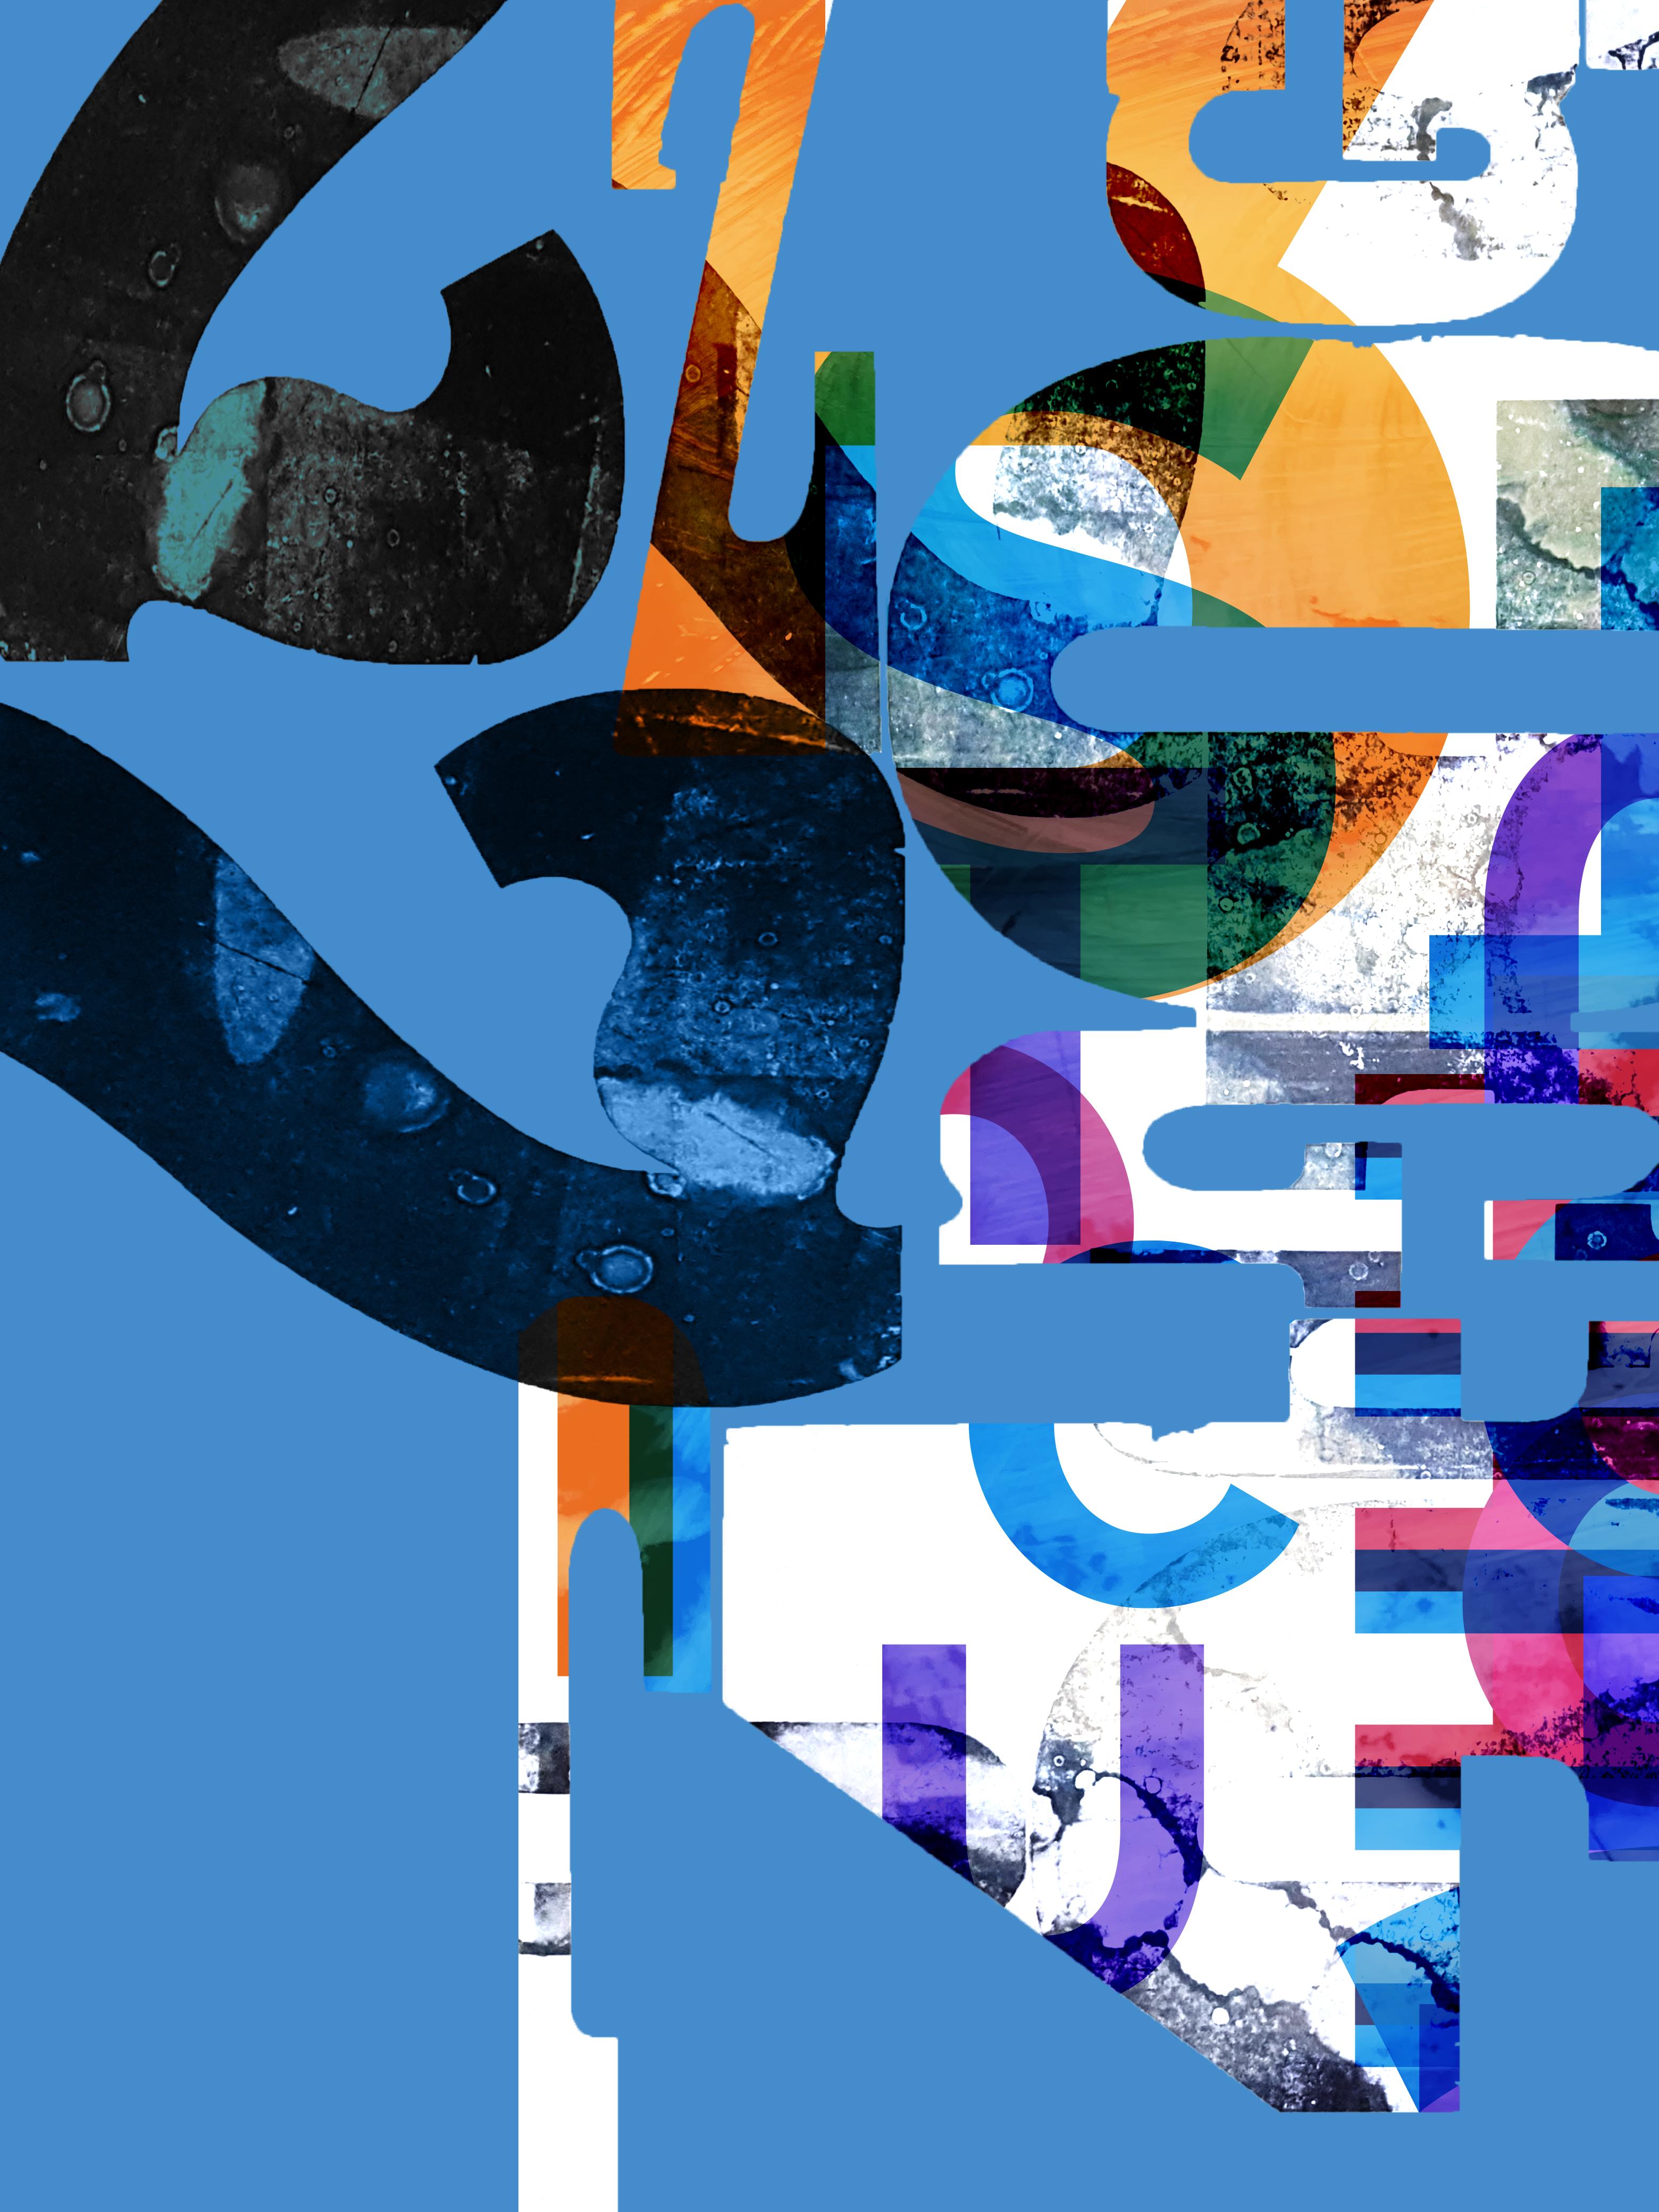 Tidal Waves Letters & Digital 3120X4160 Px